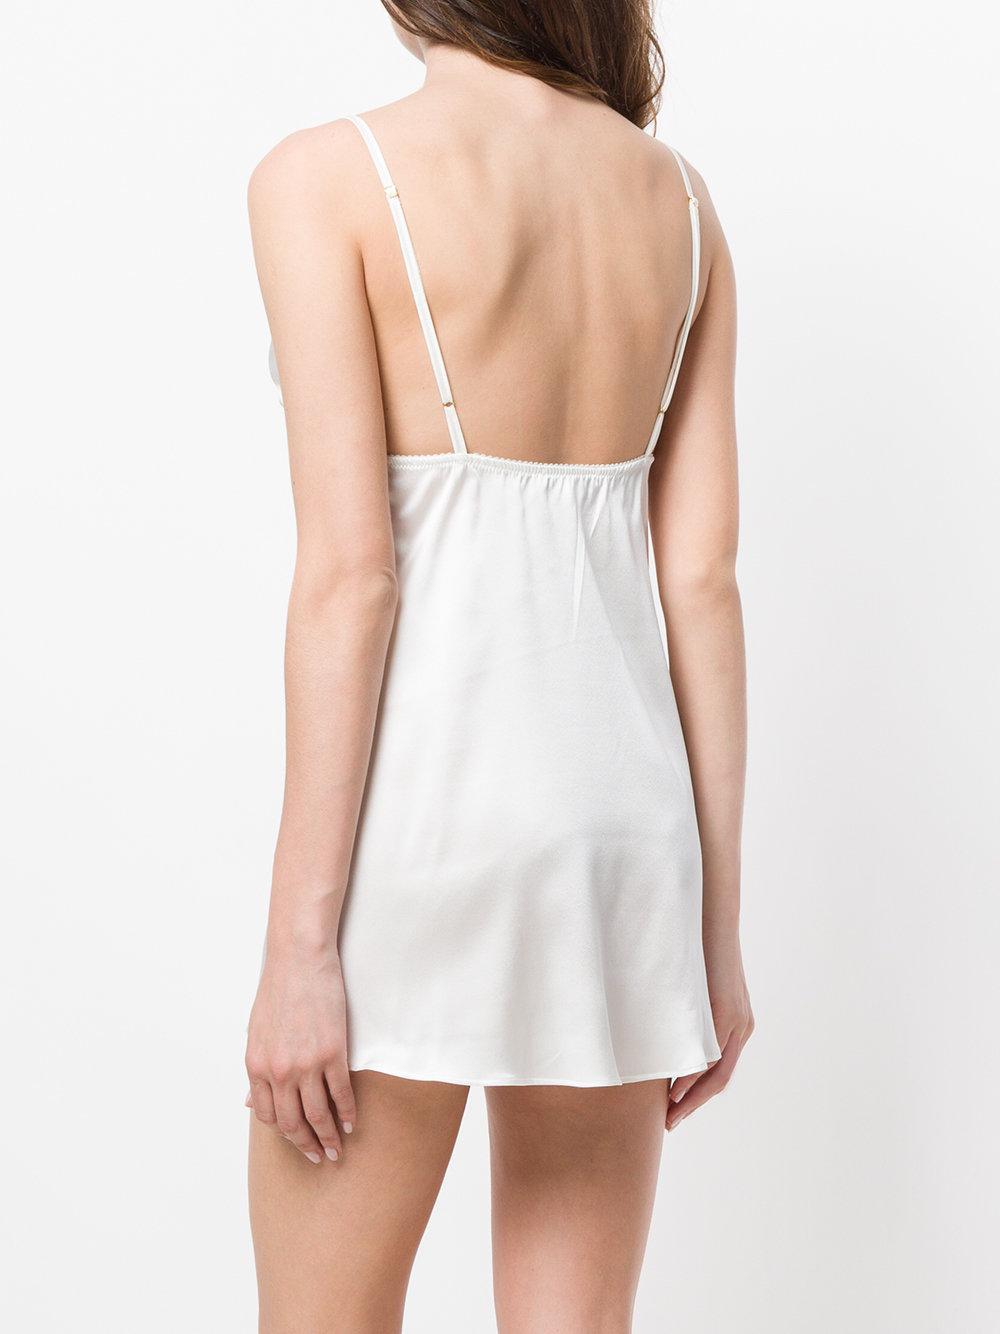 Rita babydoll - White Gilda & Pearl Outlet Marketable Wiki Cheap Online Cheap Sale Sneakernews Brand New Unisex Cheap Price qzNtLXGeny